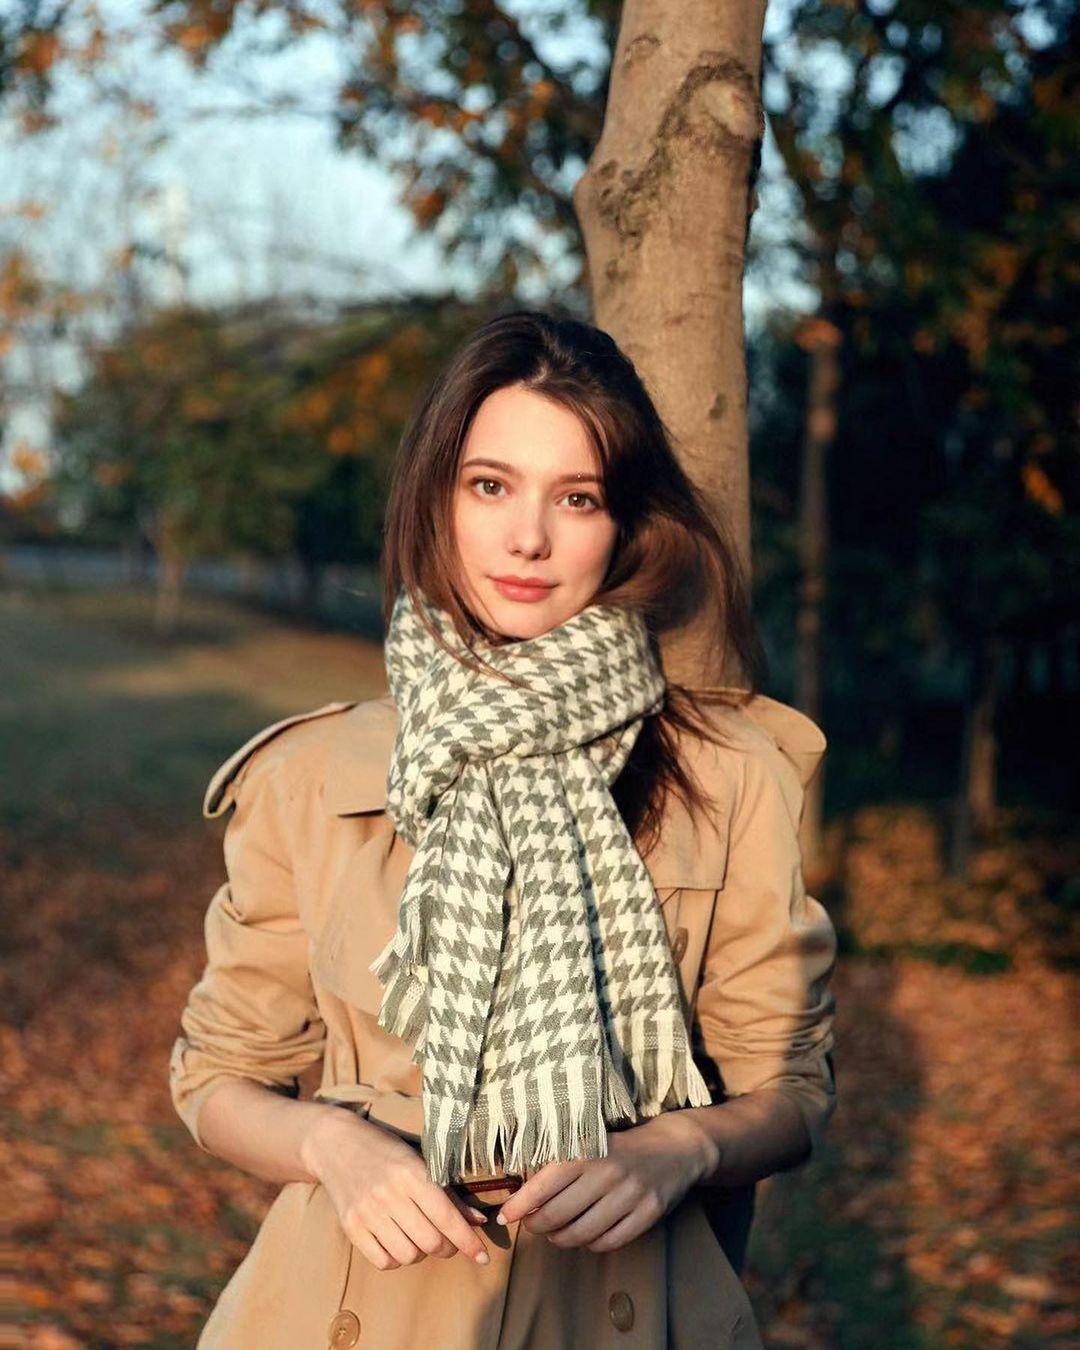 Anastasia-Cebulska-6